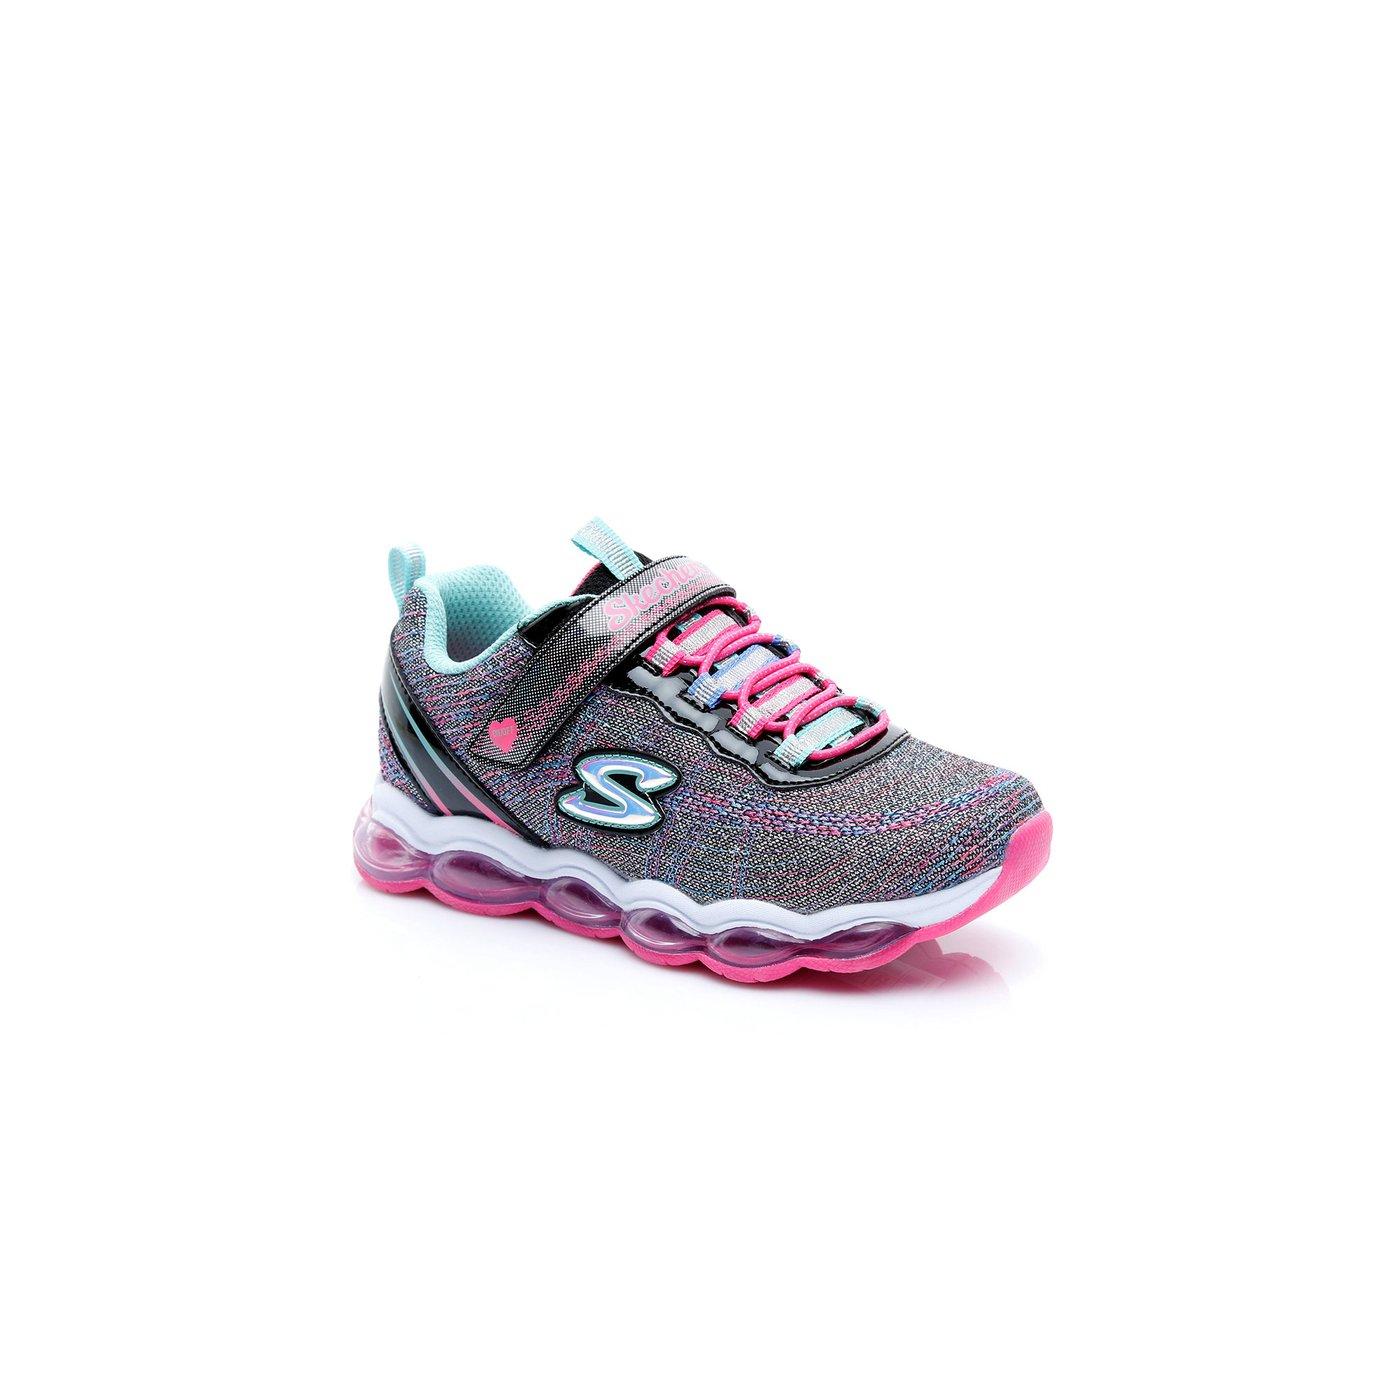 Skechers Air Lites Kız Çocuk Gri - Pembe Spor Ayakkabı